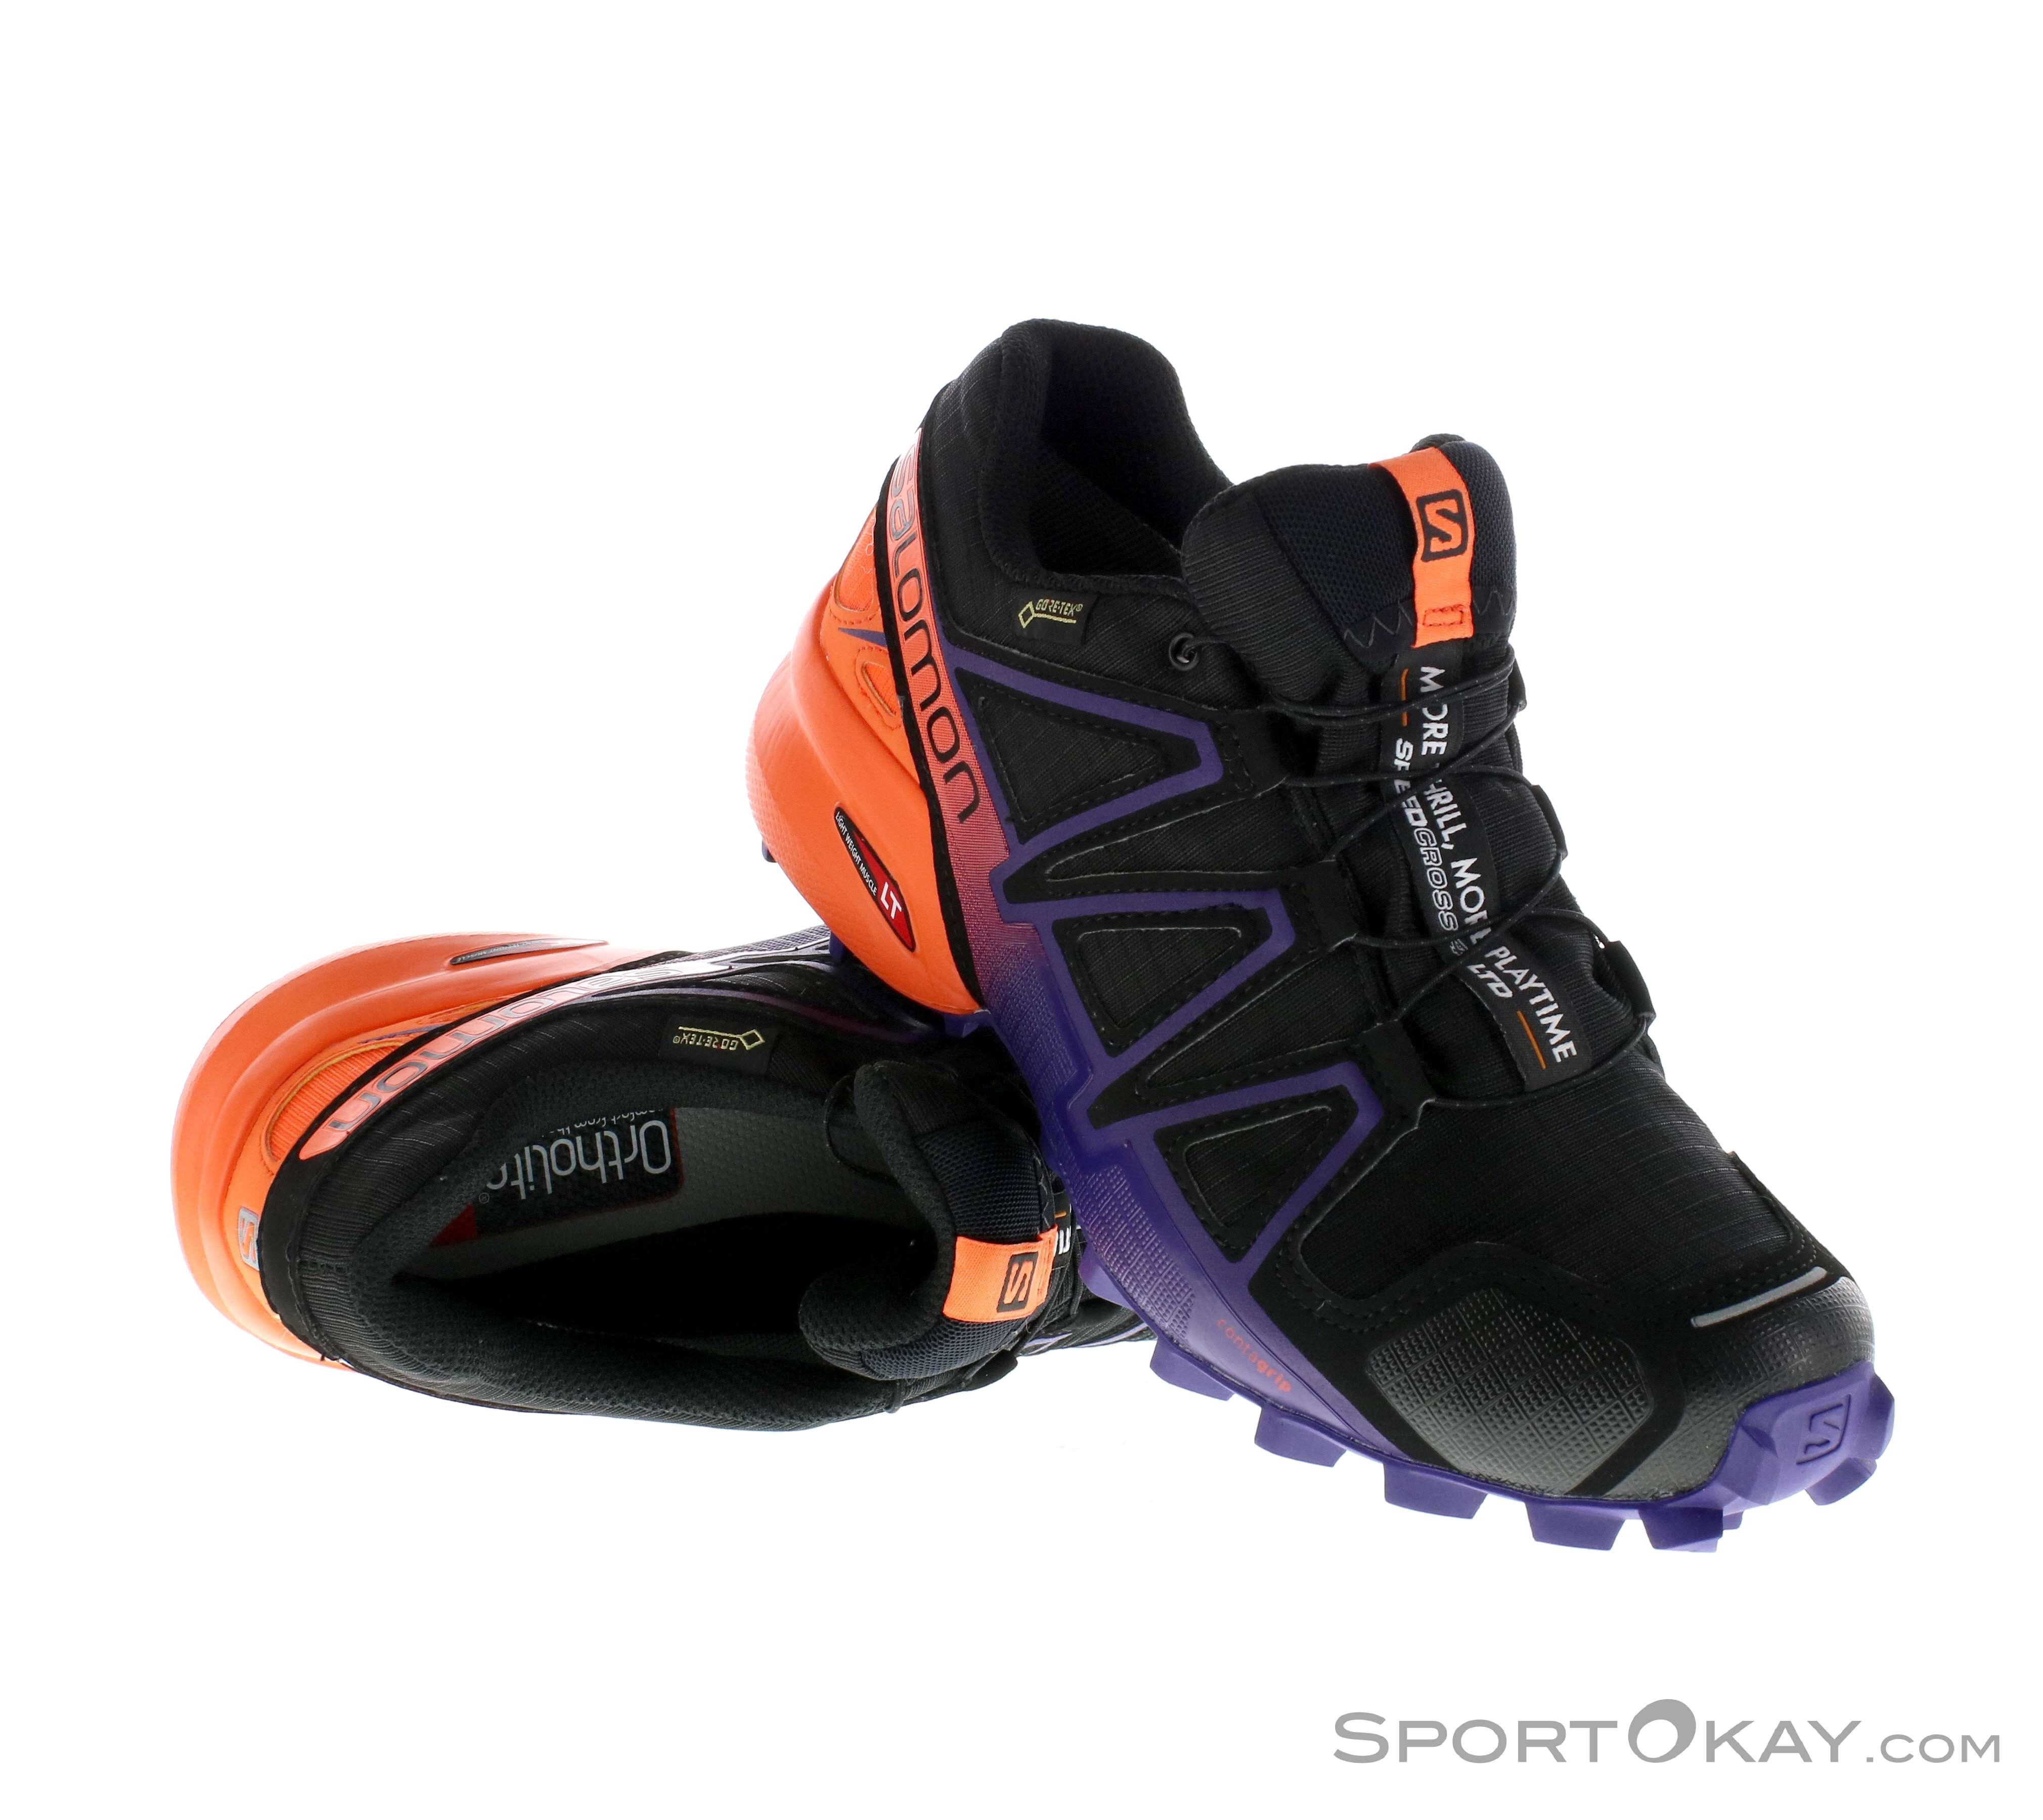 Salomon Speedcross 4 GTX Damen Traillaufschuhe Gore Tex